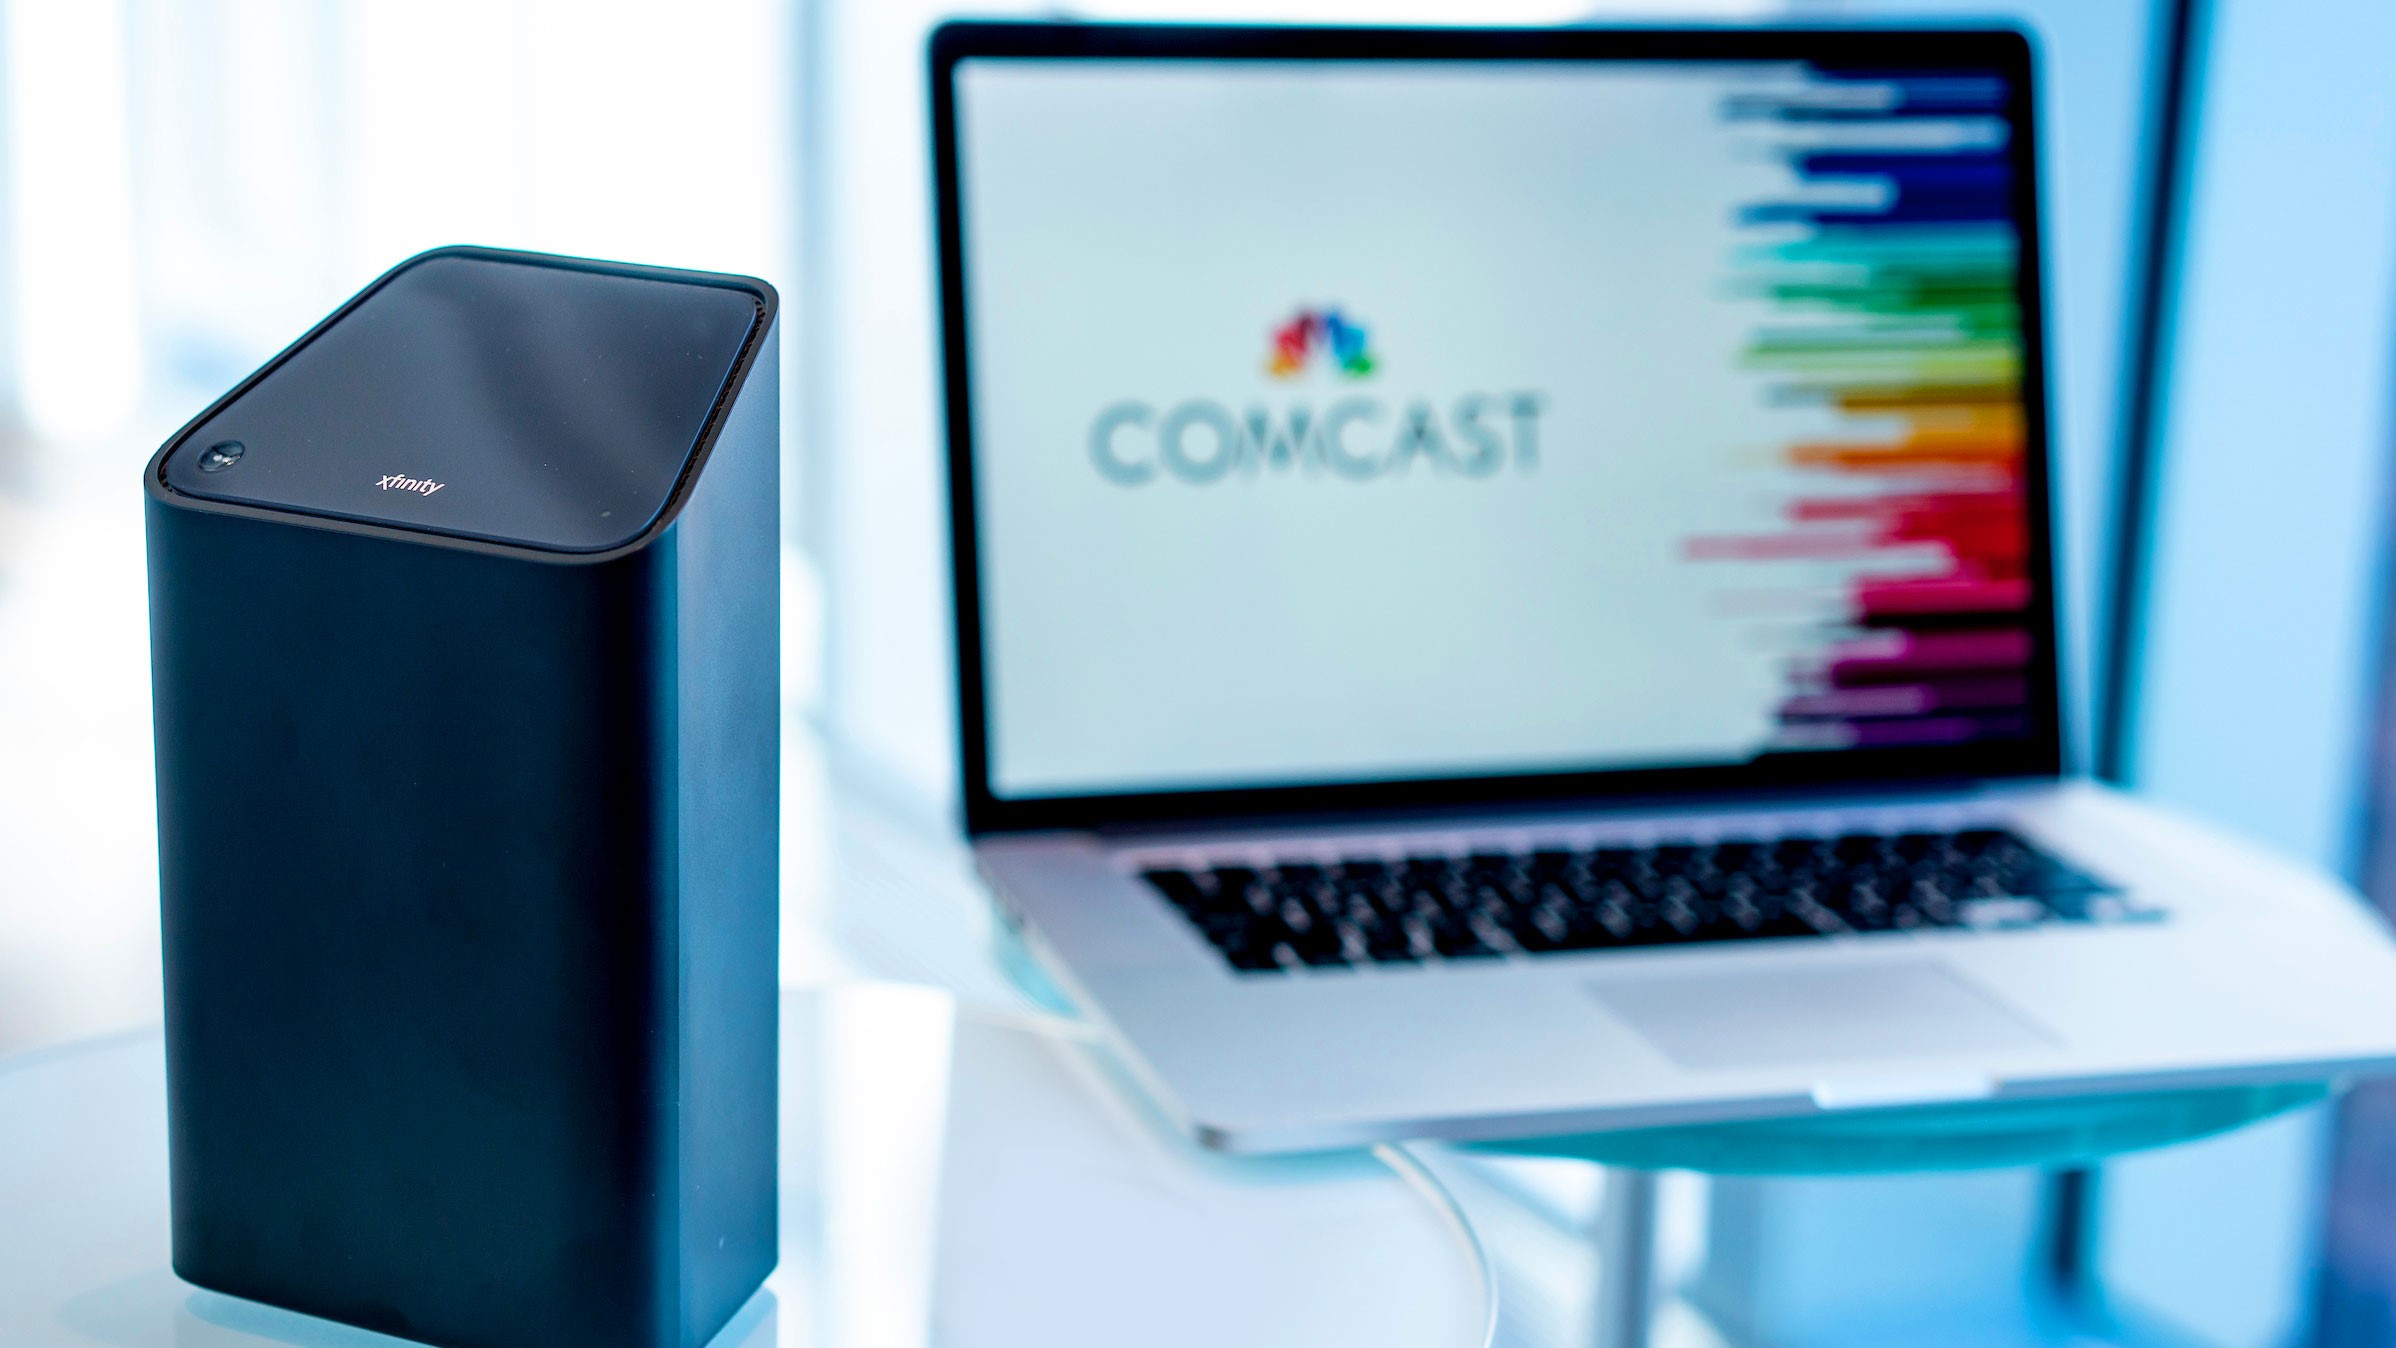 An Xfinity xFi Advanced Gateway and a laptop displaying the Comcast logo